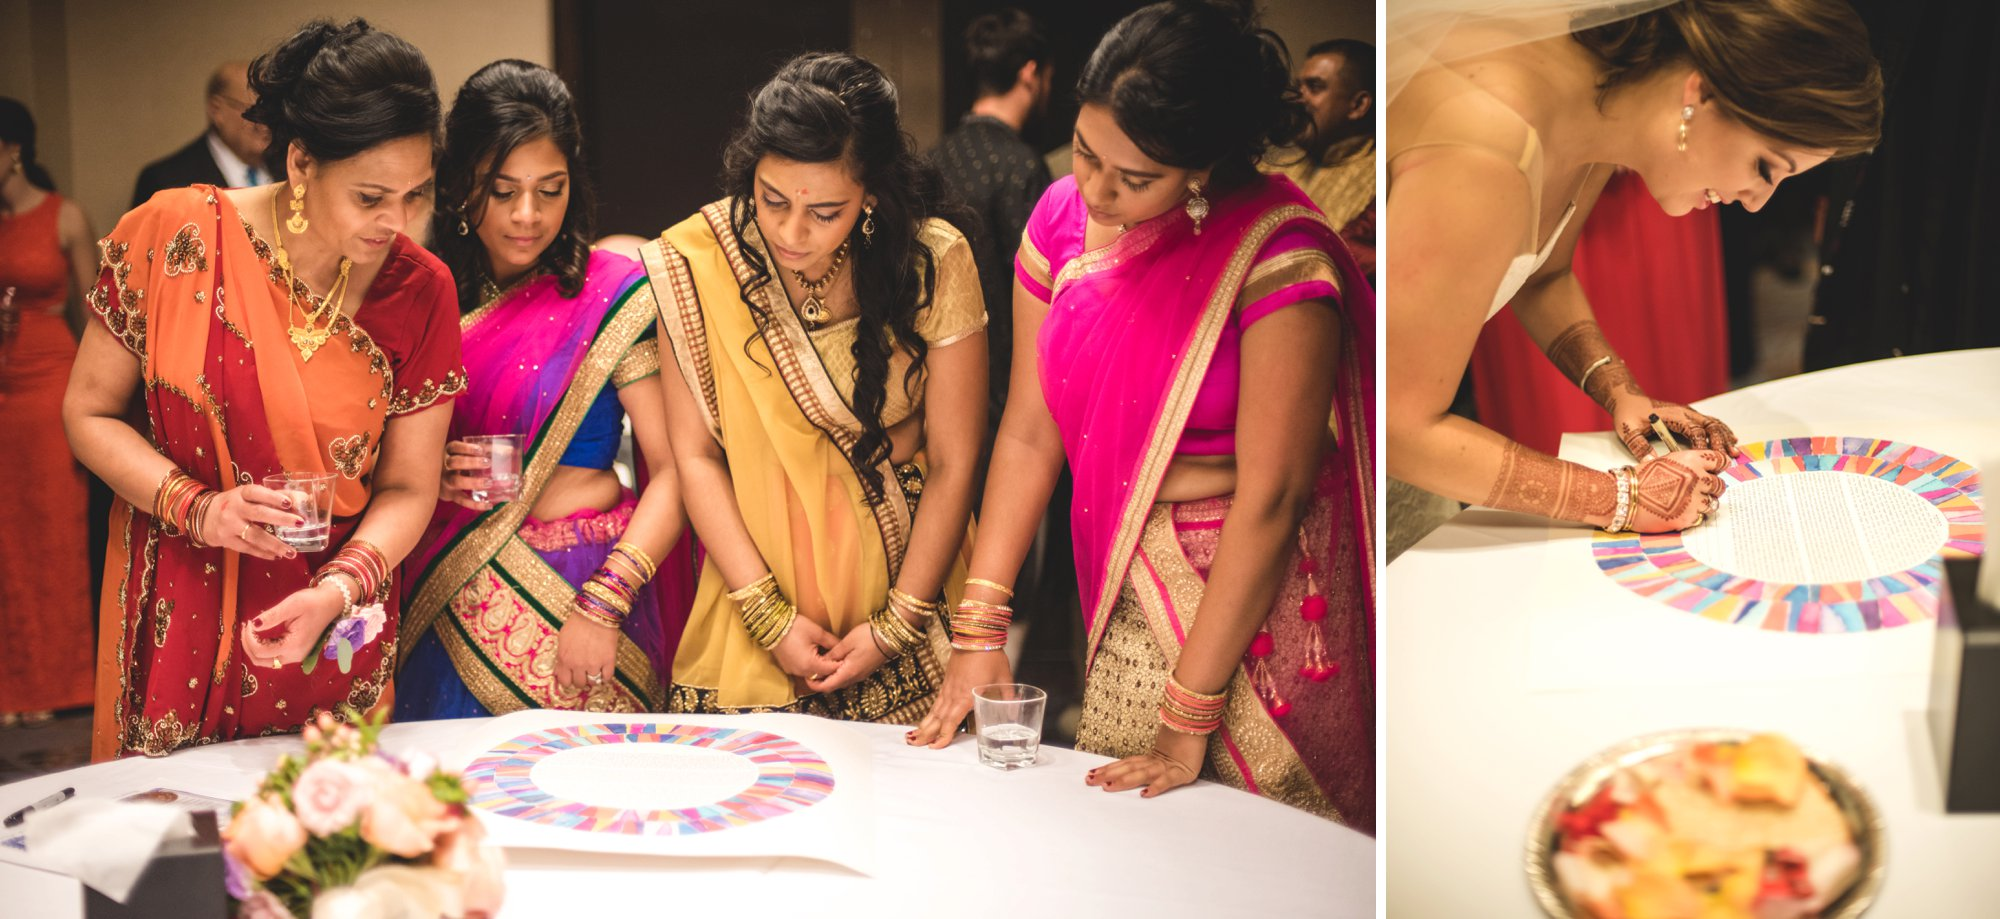 Washington DC colorful Indian wedding with a feminist bride. Ketubah signing.